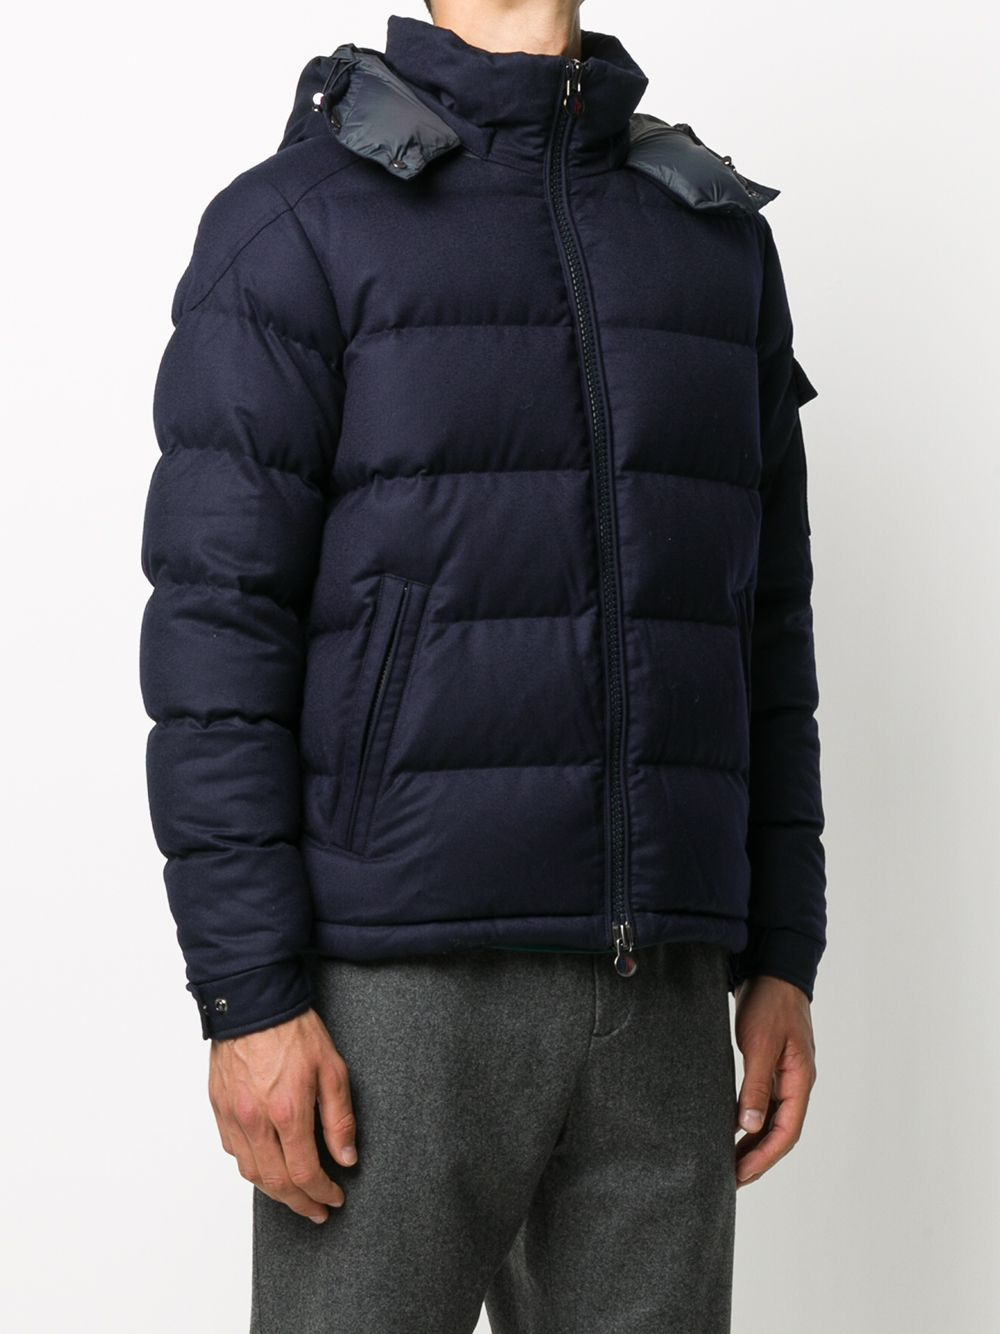 navy blue feather down zip-up padded Montgenevre jacket MONCLER |  | MONTGENEVRE 1A537-00-54272742